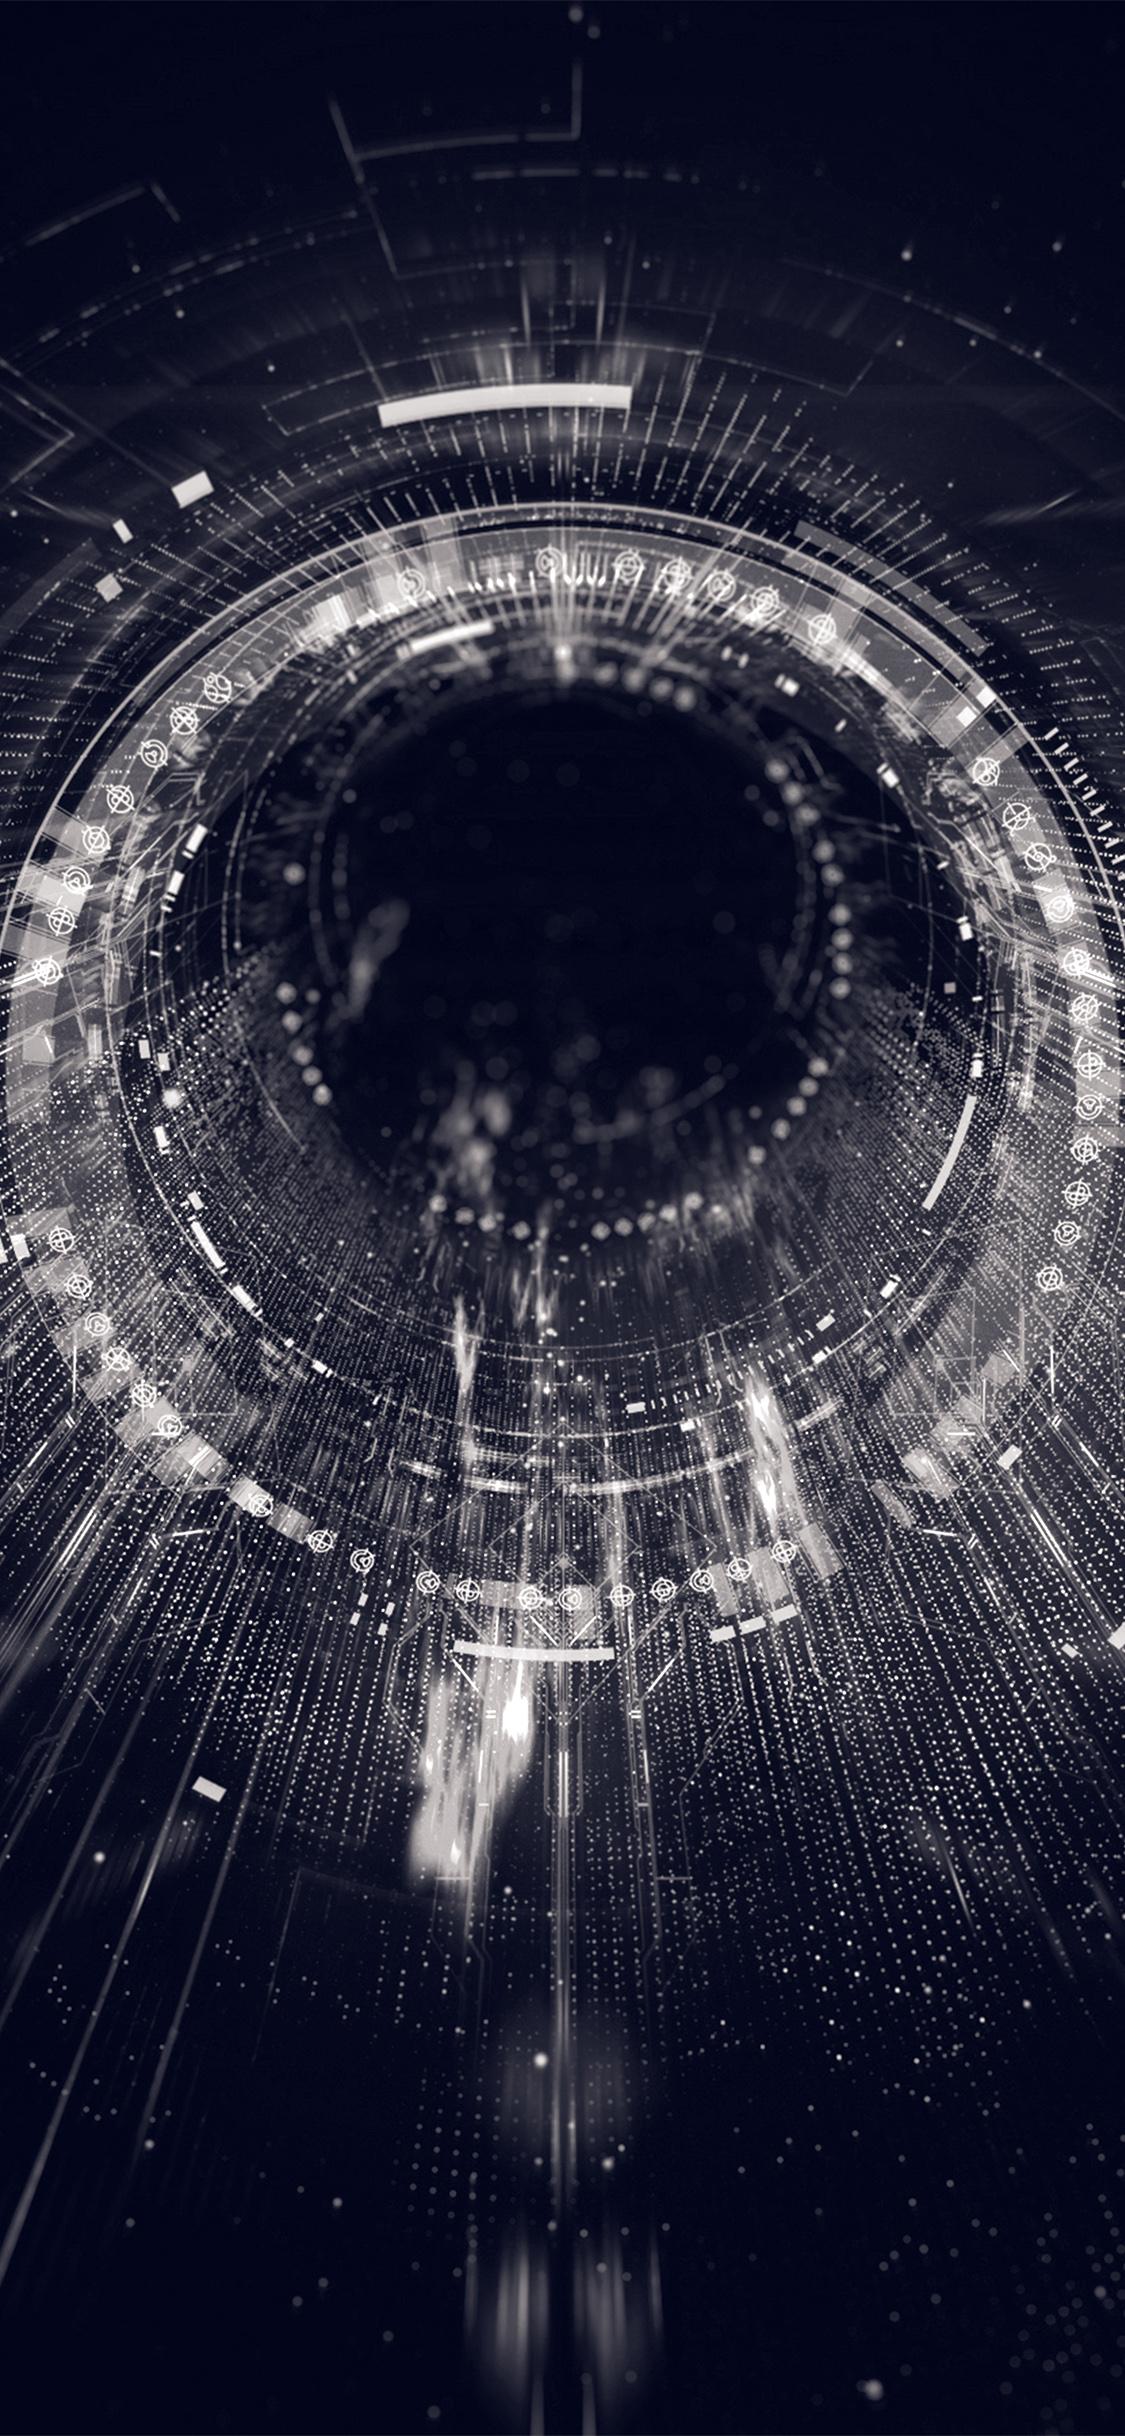 iPhoneXpapers.com-Apple-iPhone-wallpaper-ba06-circle-blackhole-dark-bw-digital-illustration-art